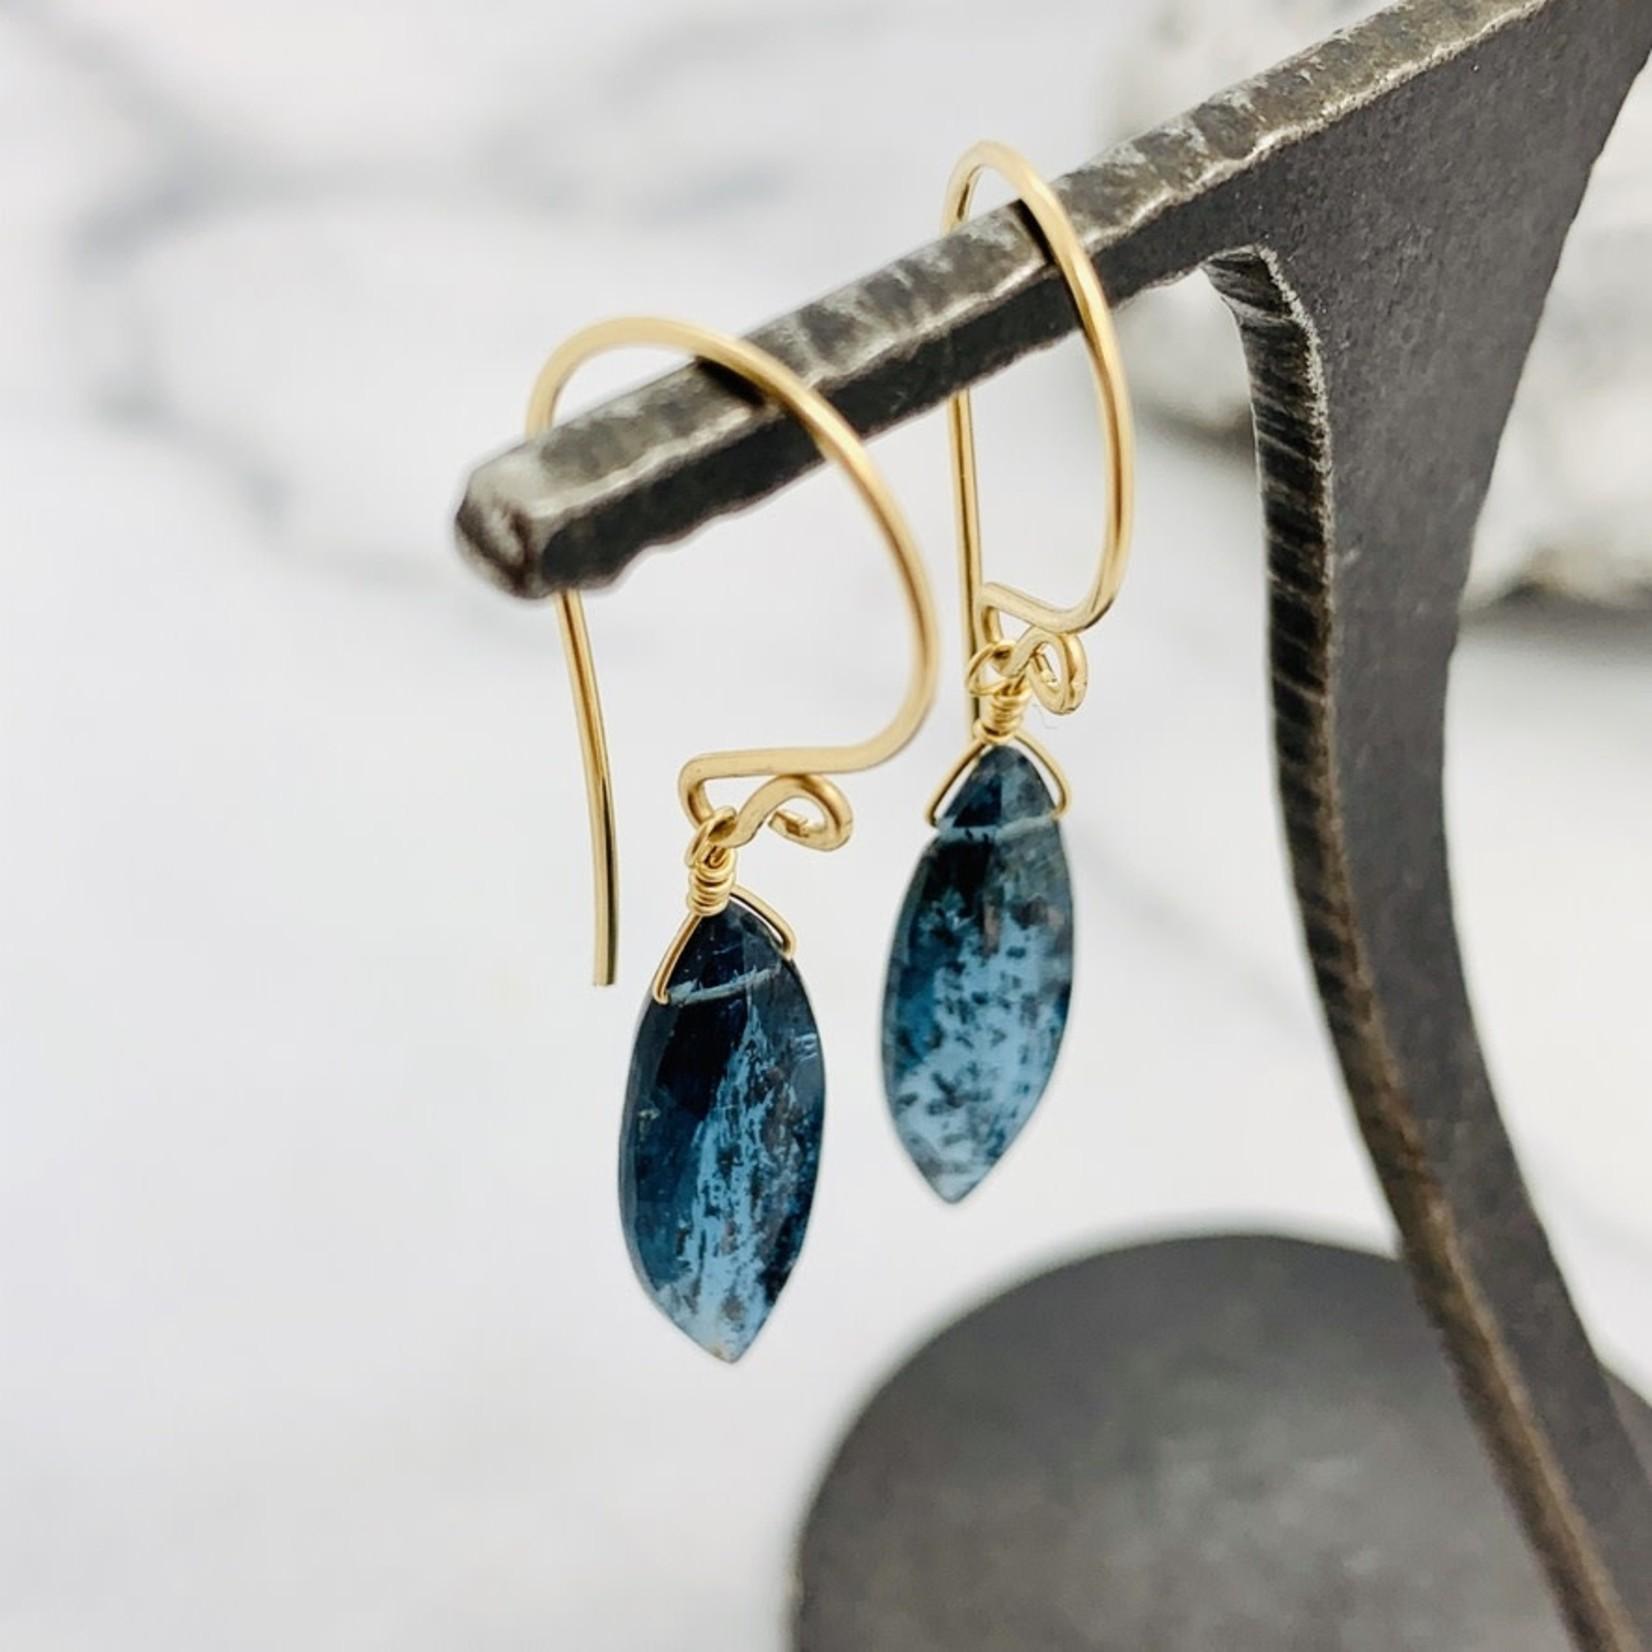 Handmade Marquis Moss Kyanite 14k Goldfill Drop Earrings